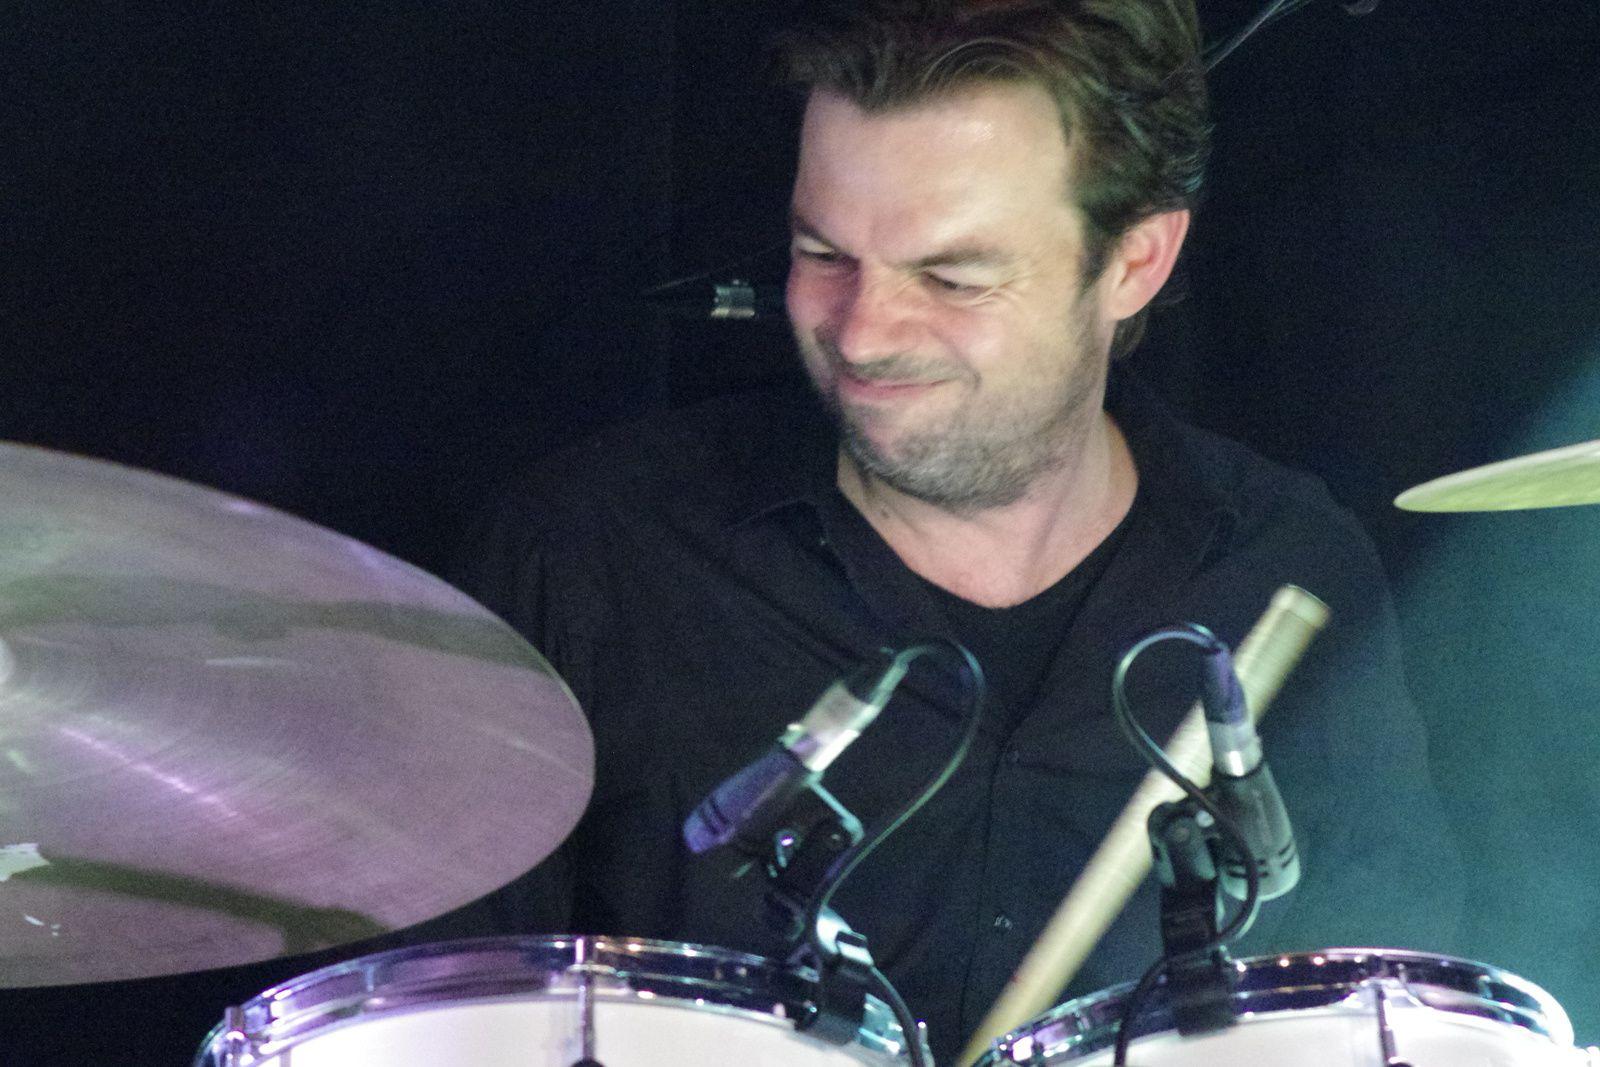 Jimmy Reiter - 19 mars 2014 - La Boite à Musiques, Wattrelos (59)